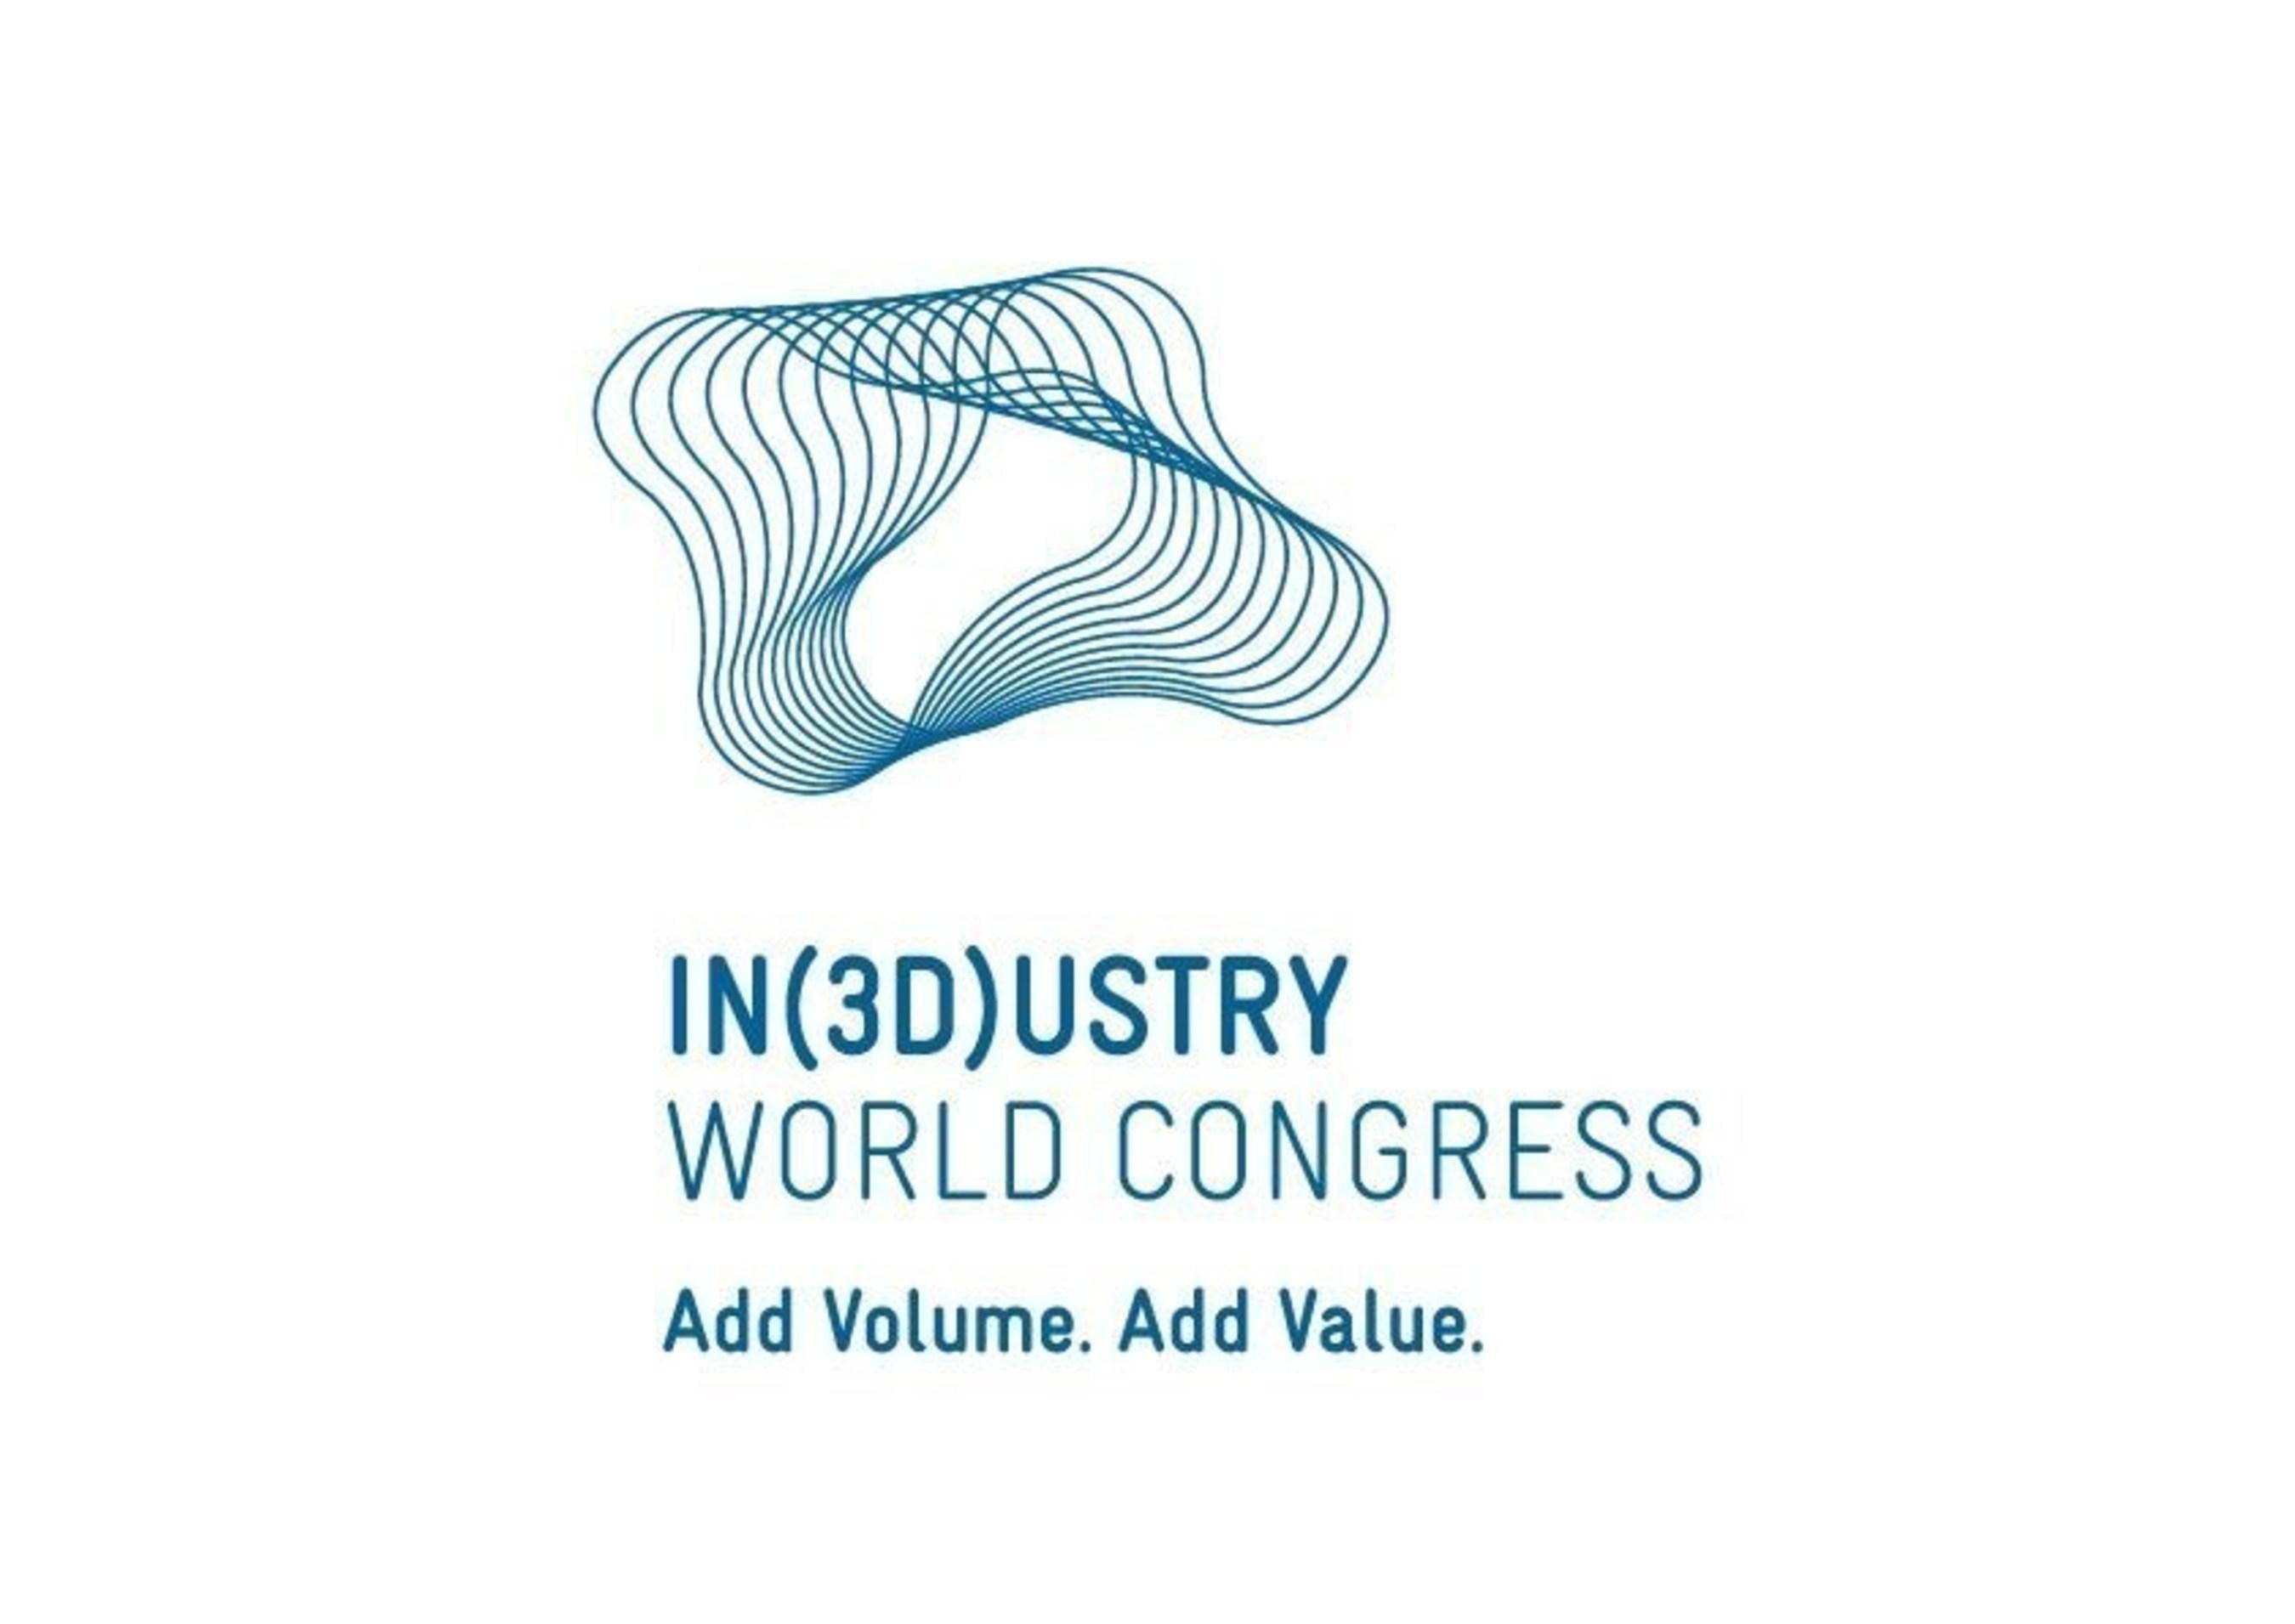 In(3D)ustryWorld Congress (PRNewsFoto/Fira de Barcelona) (PRNewsFoto/Fira de Barcelona)